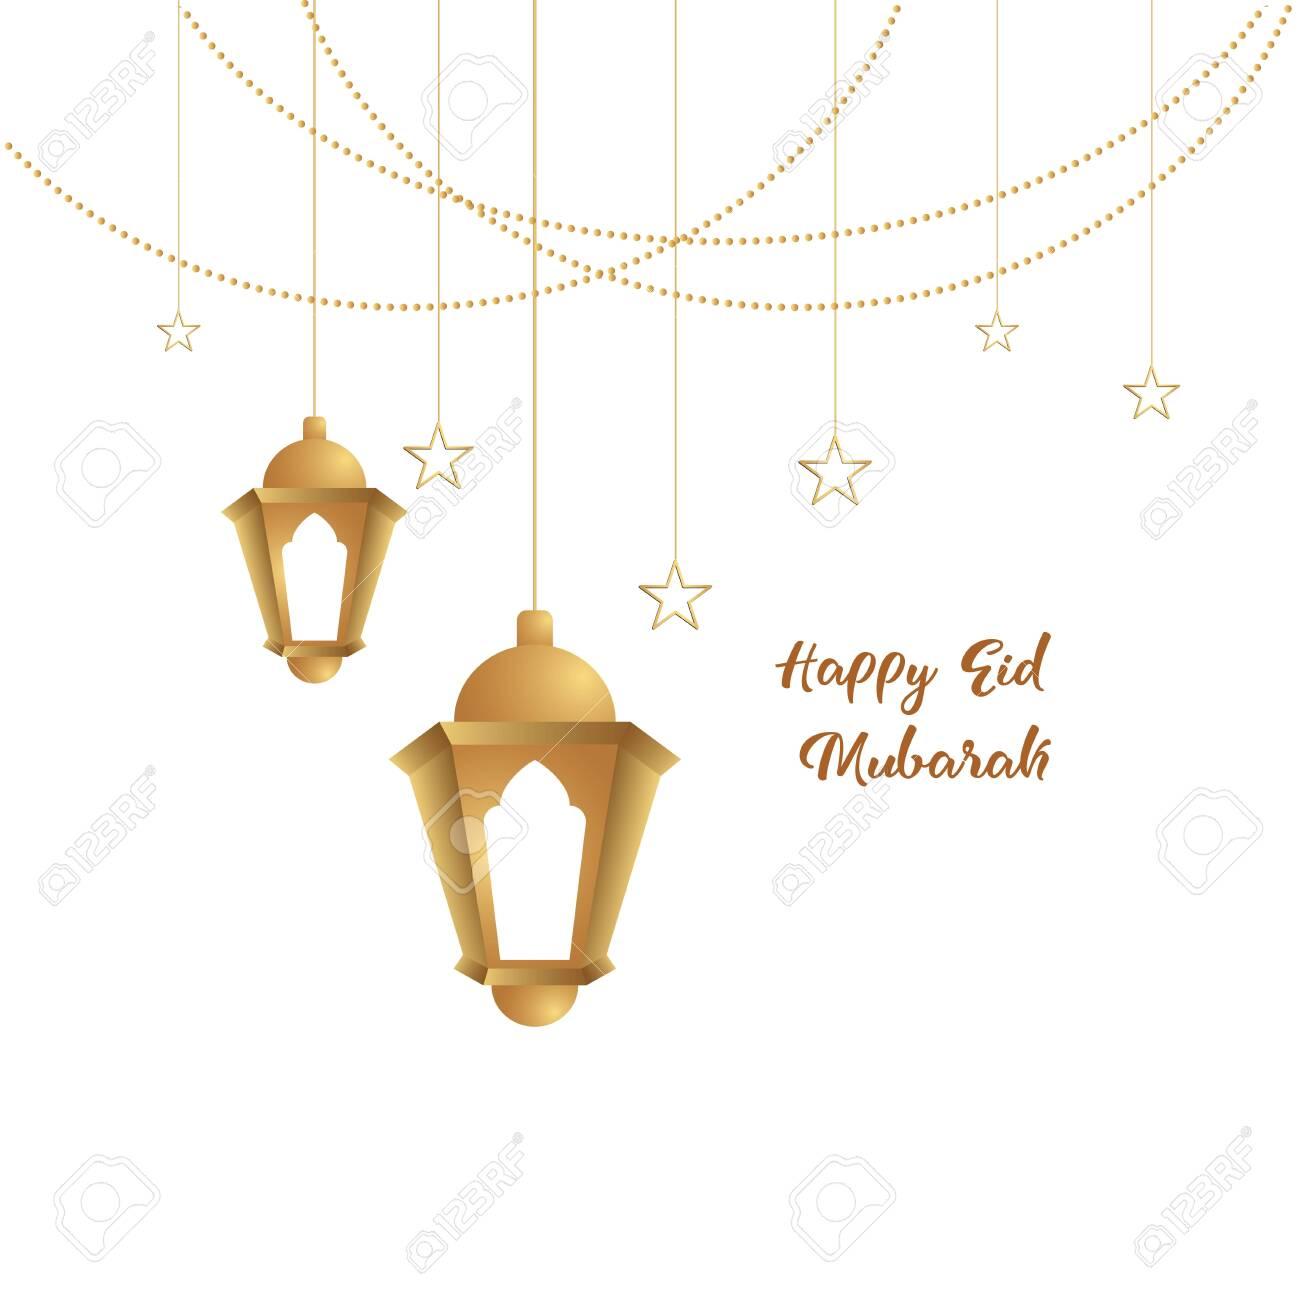 Ramadan Mubarak Background Happy Eid Mubarak Greeting Card Design Royalty Free Cliparts Vectors And Stock Illustration Image 137173678